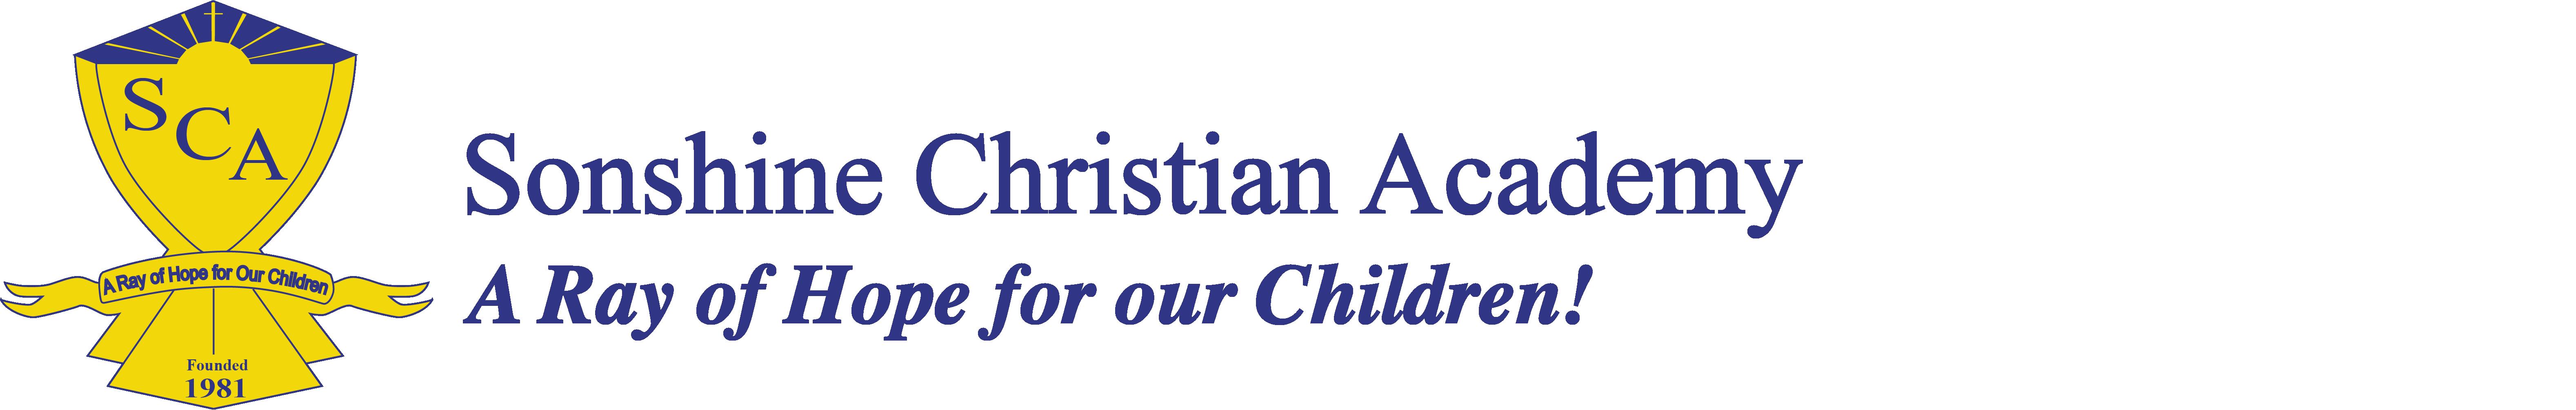 Sonshine Christian Academy